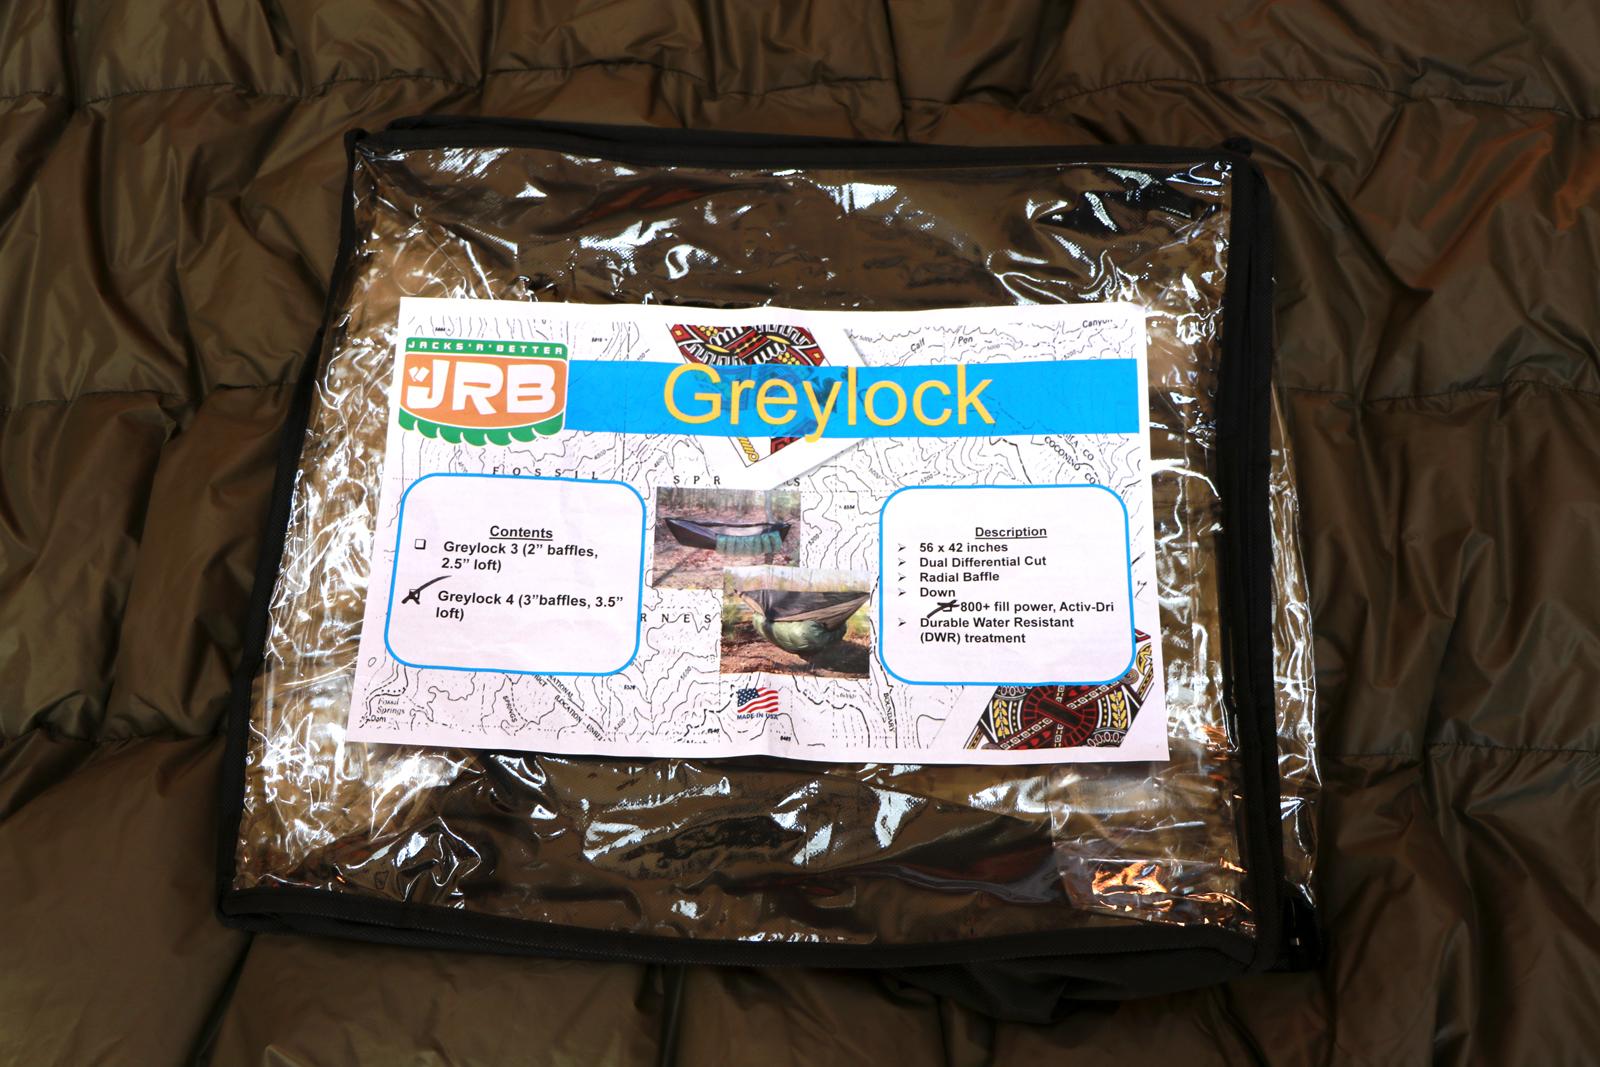 JRB Greylock 4